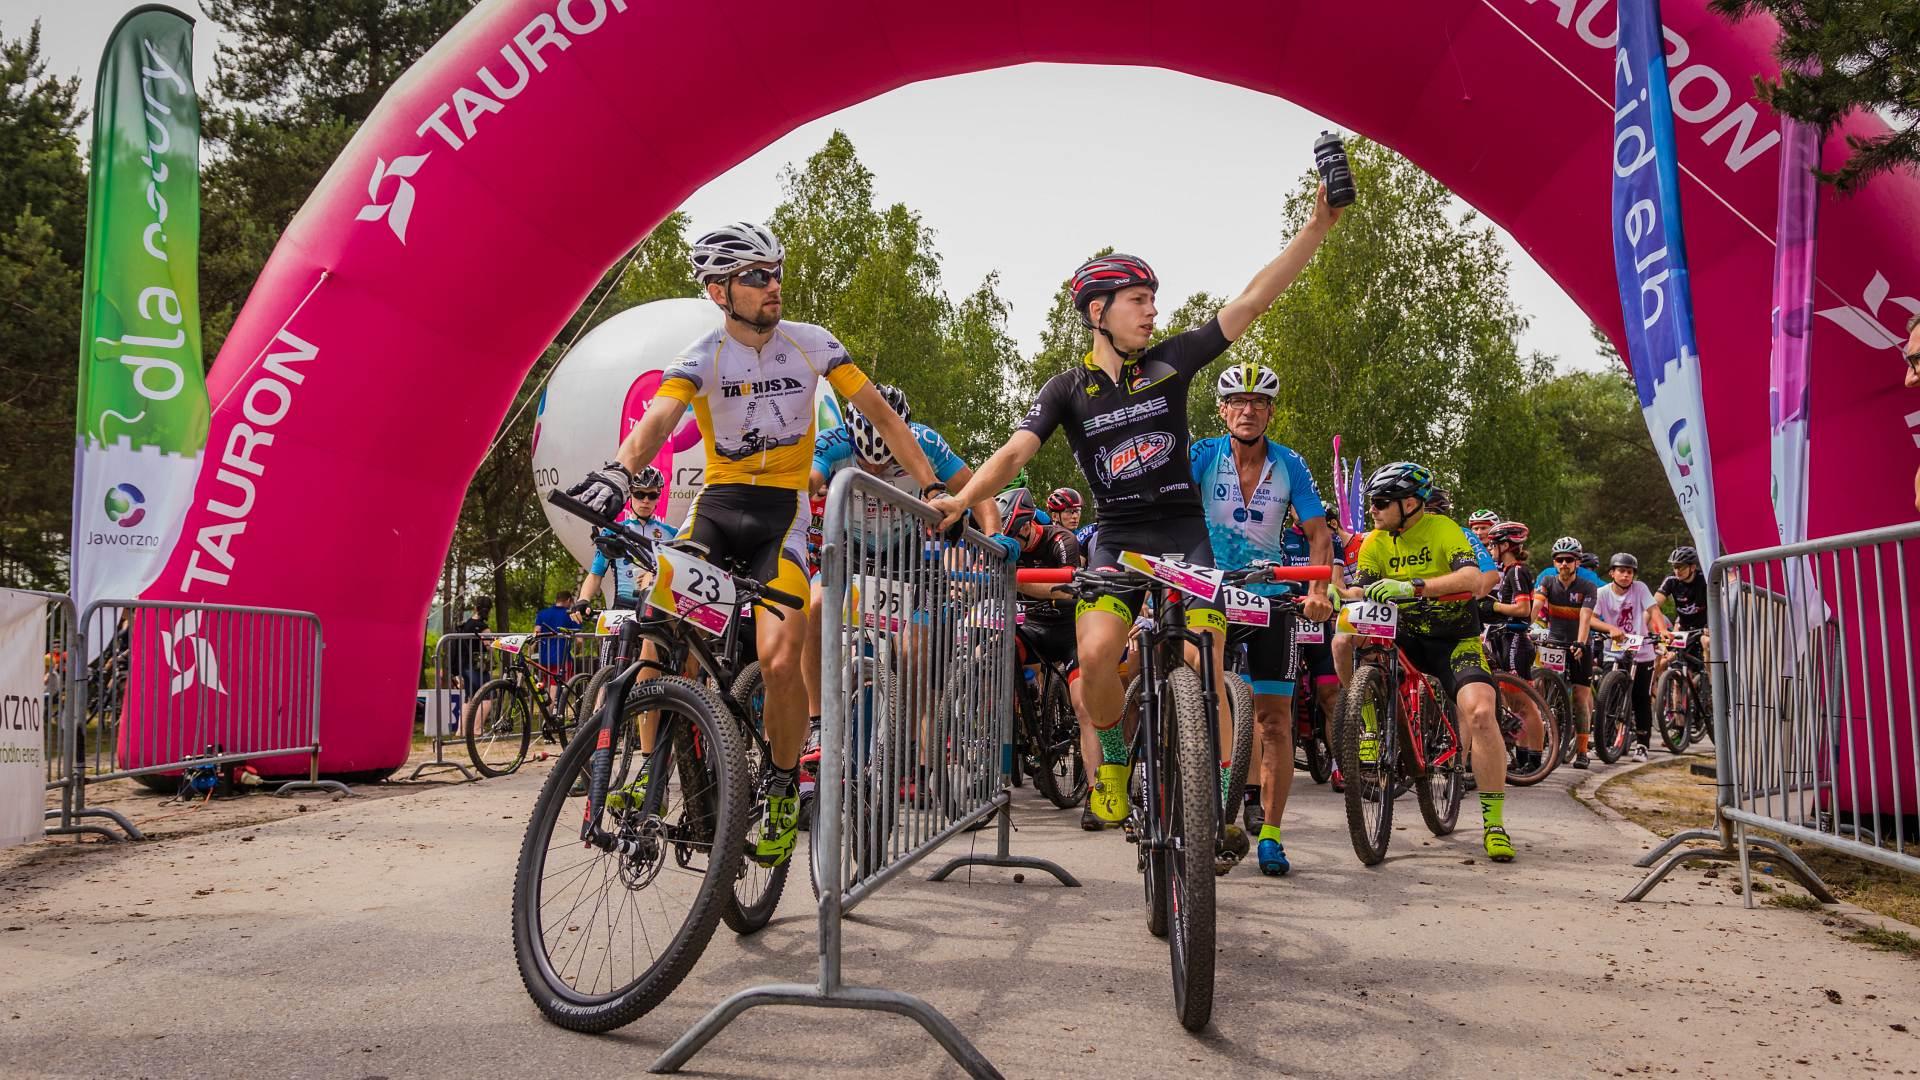 wyscig-rowerow-gorskich-0052